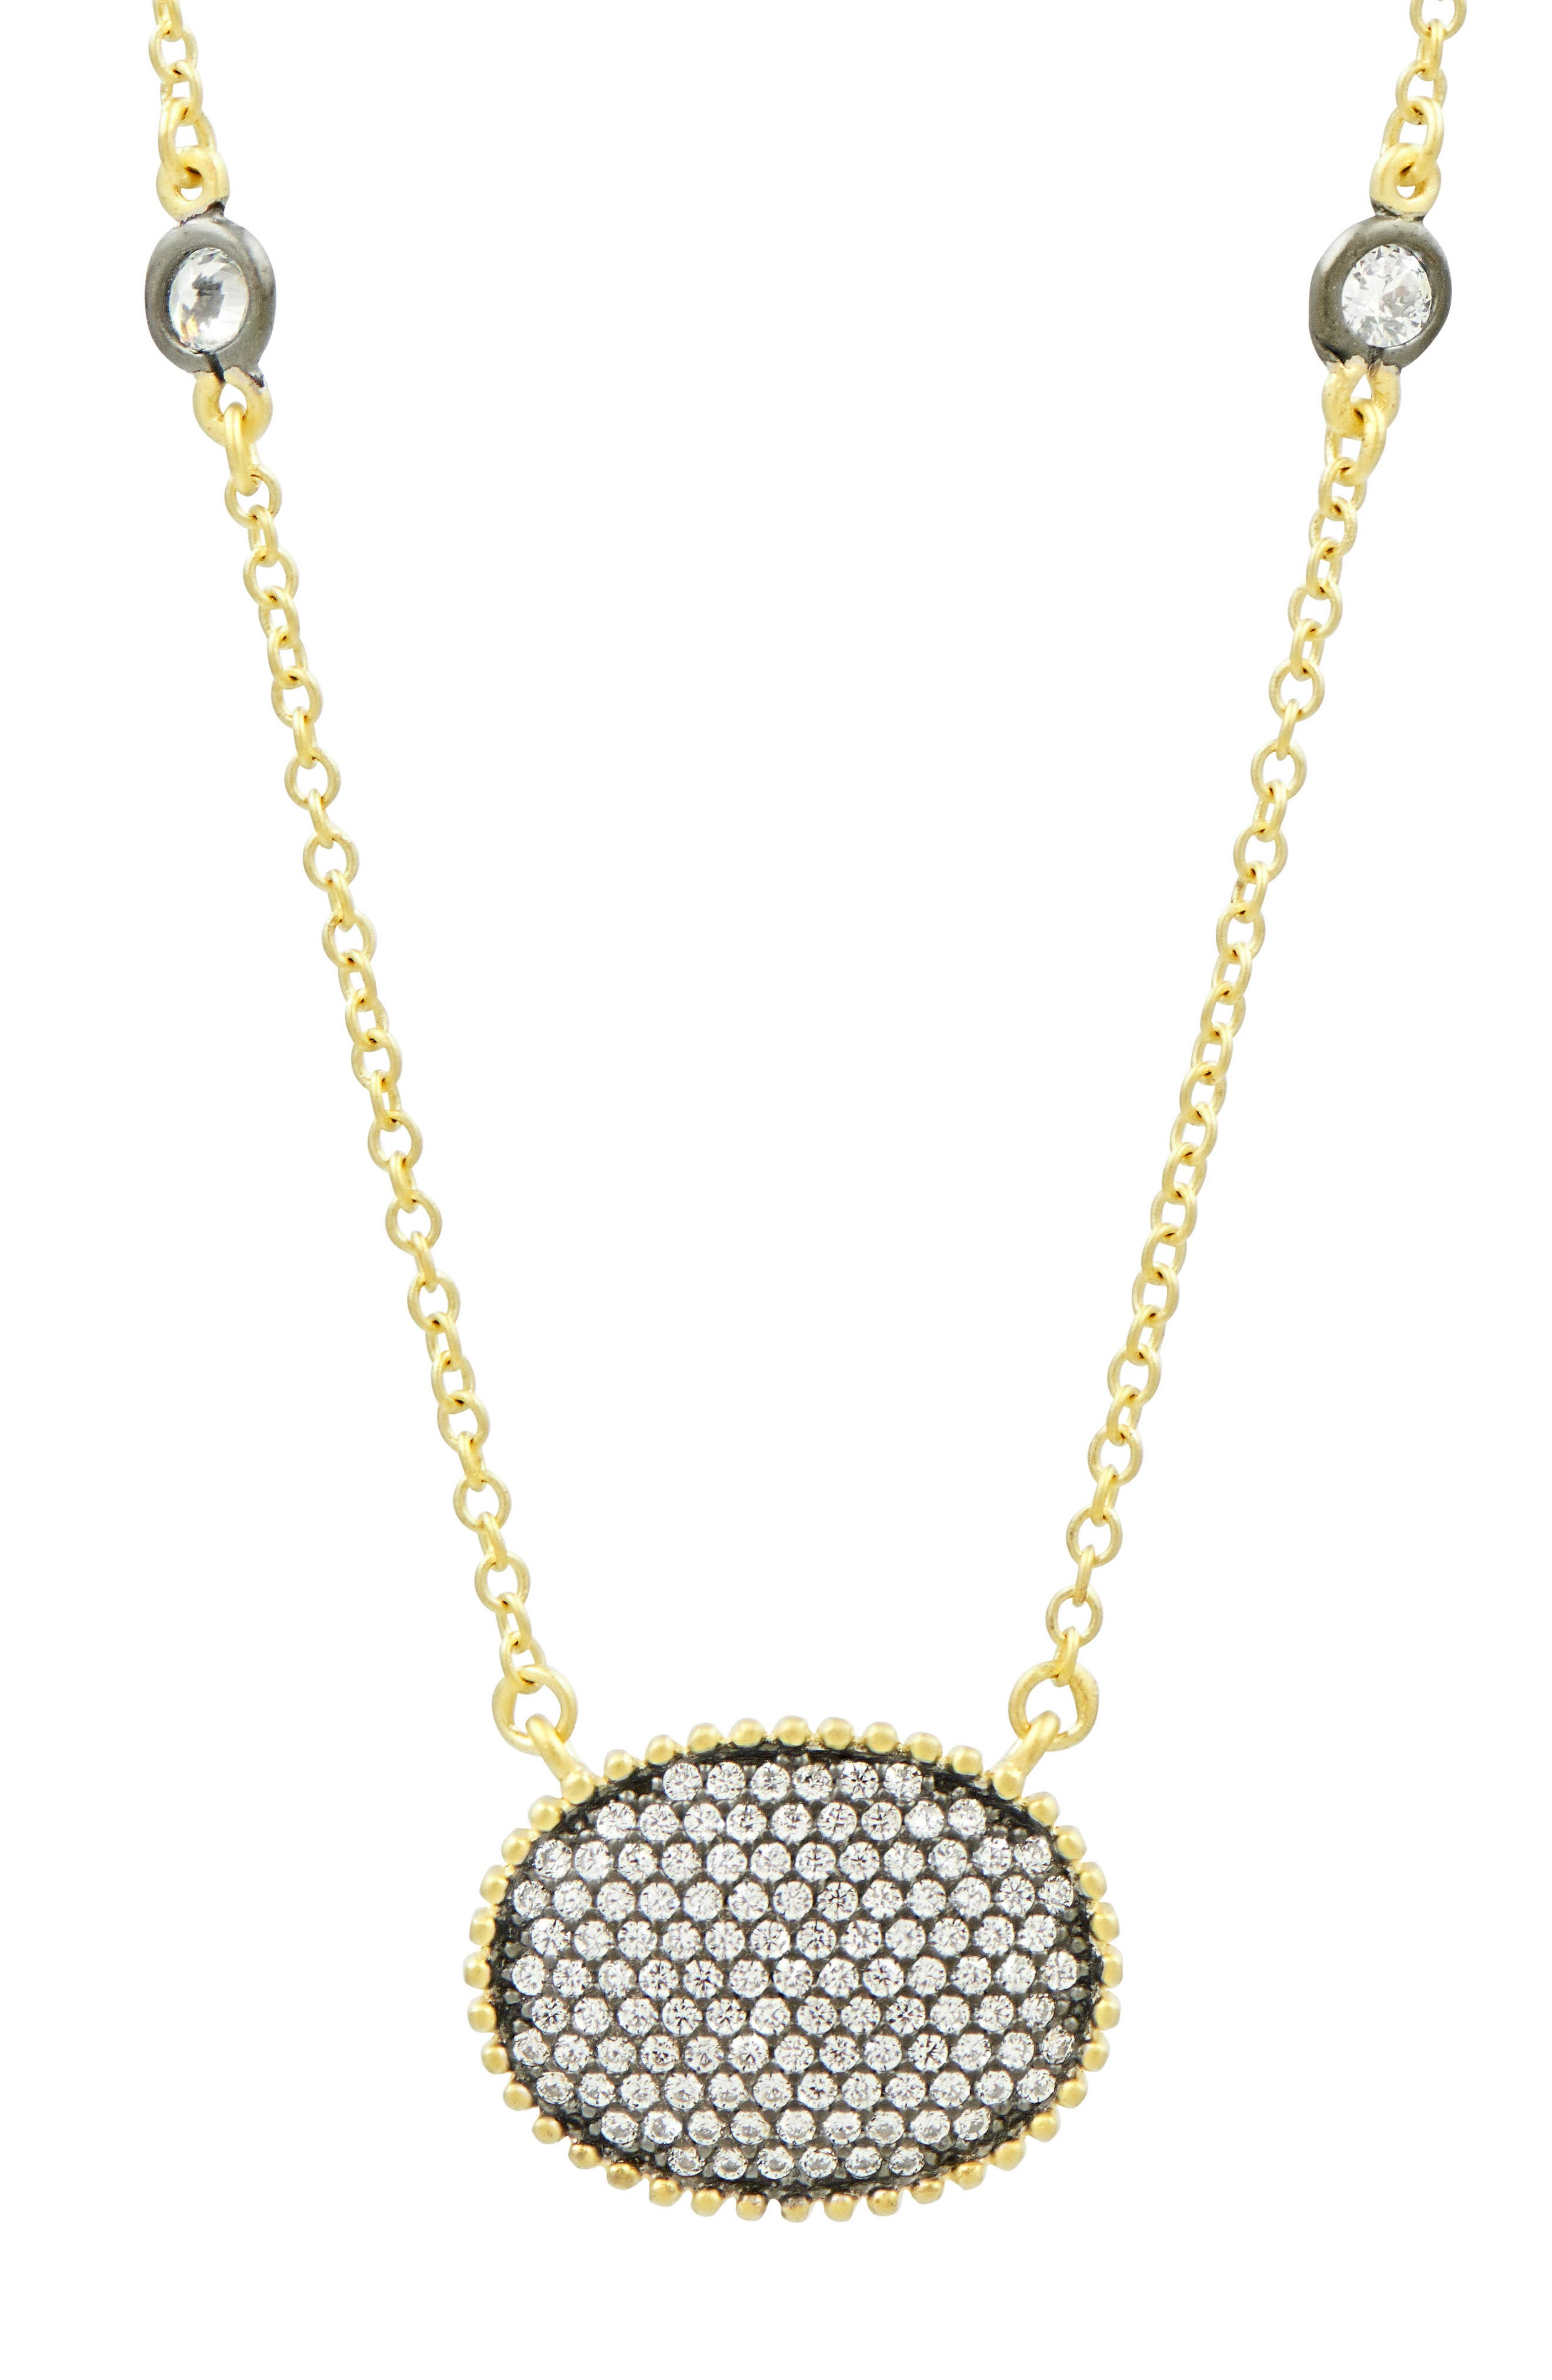 Oval Pendant Necklace,                             Main thumbnail 1, color,                             Gold/ Black Rhodium